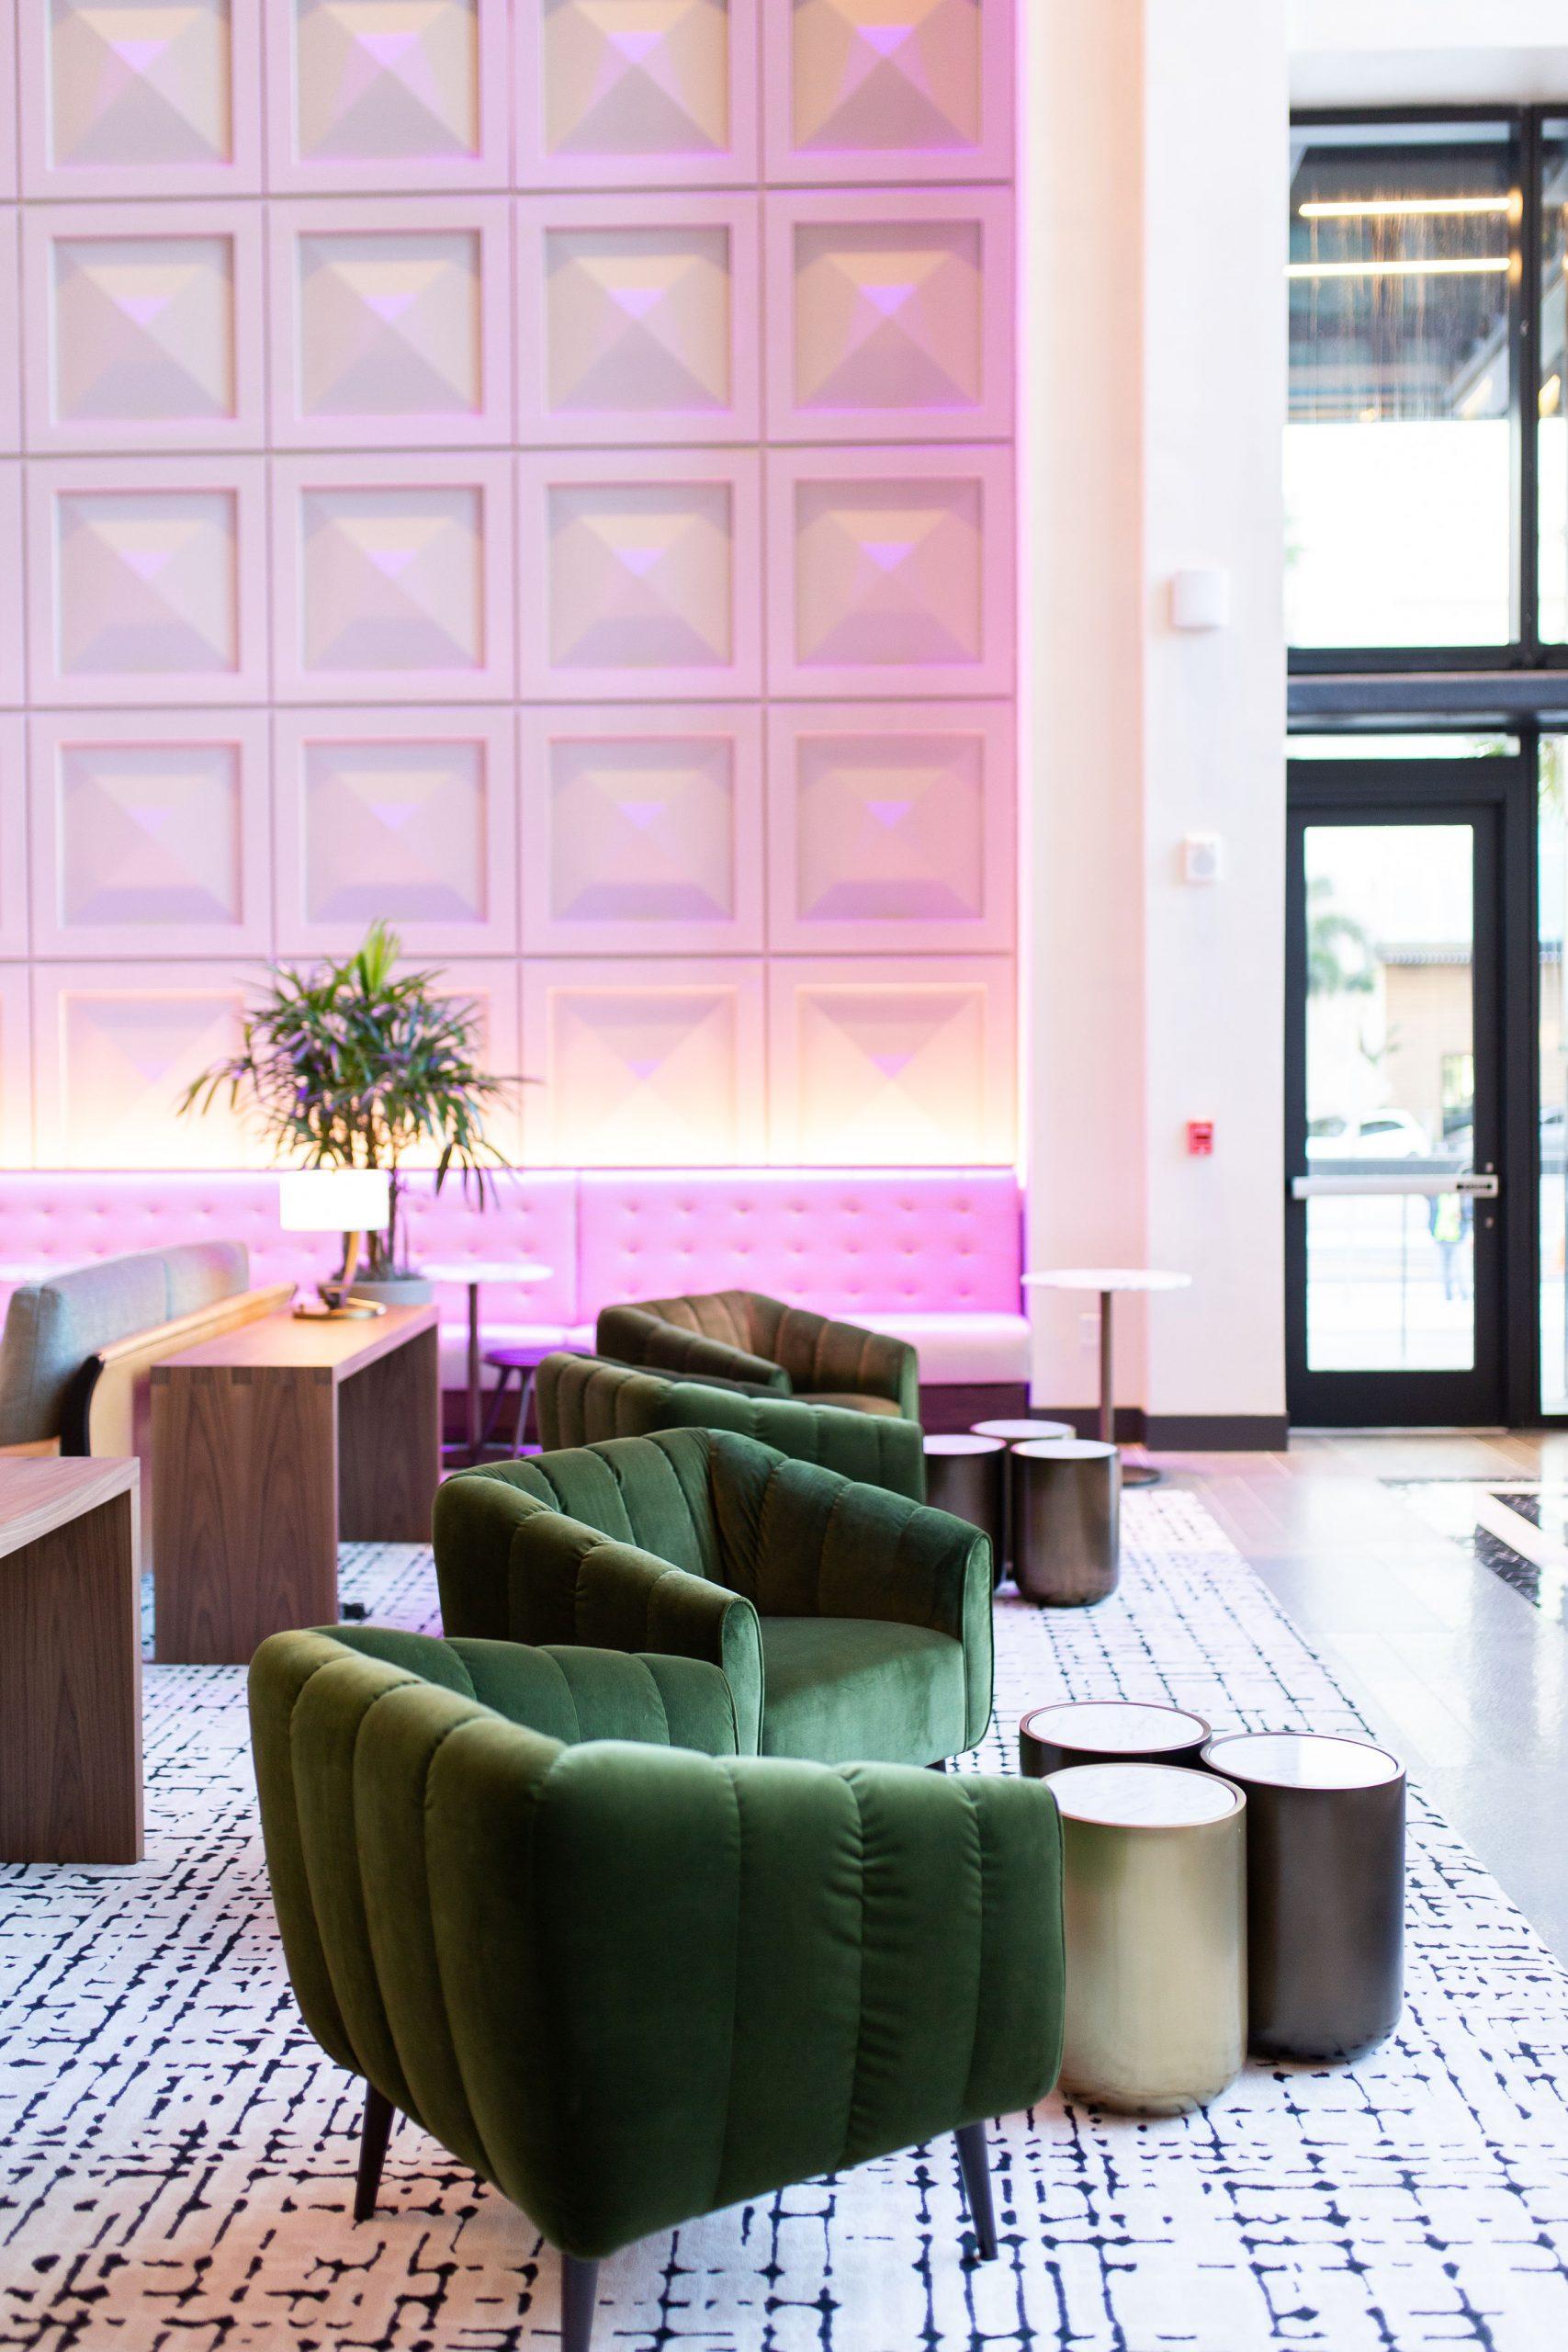 JW Marriott Driftlight Lounge. Courtesy of Strategic Property Partners.